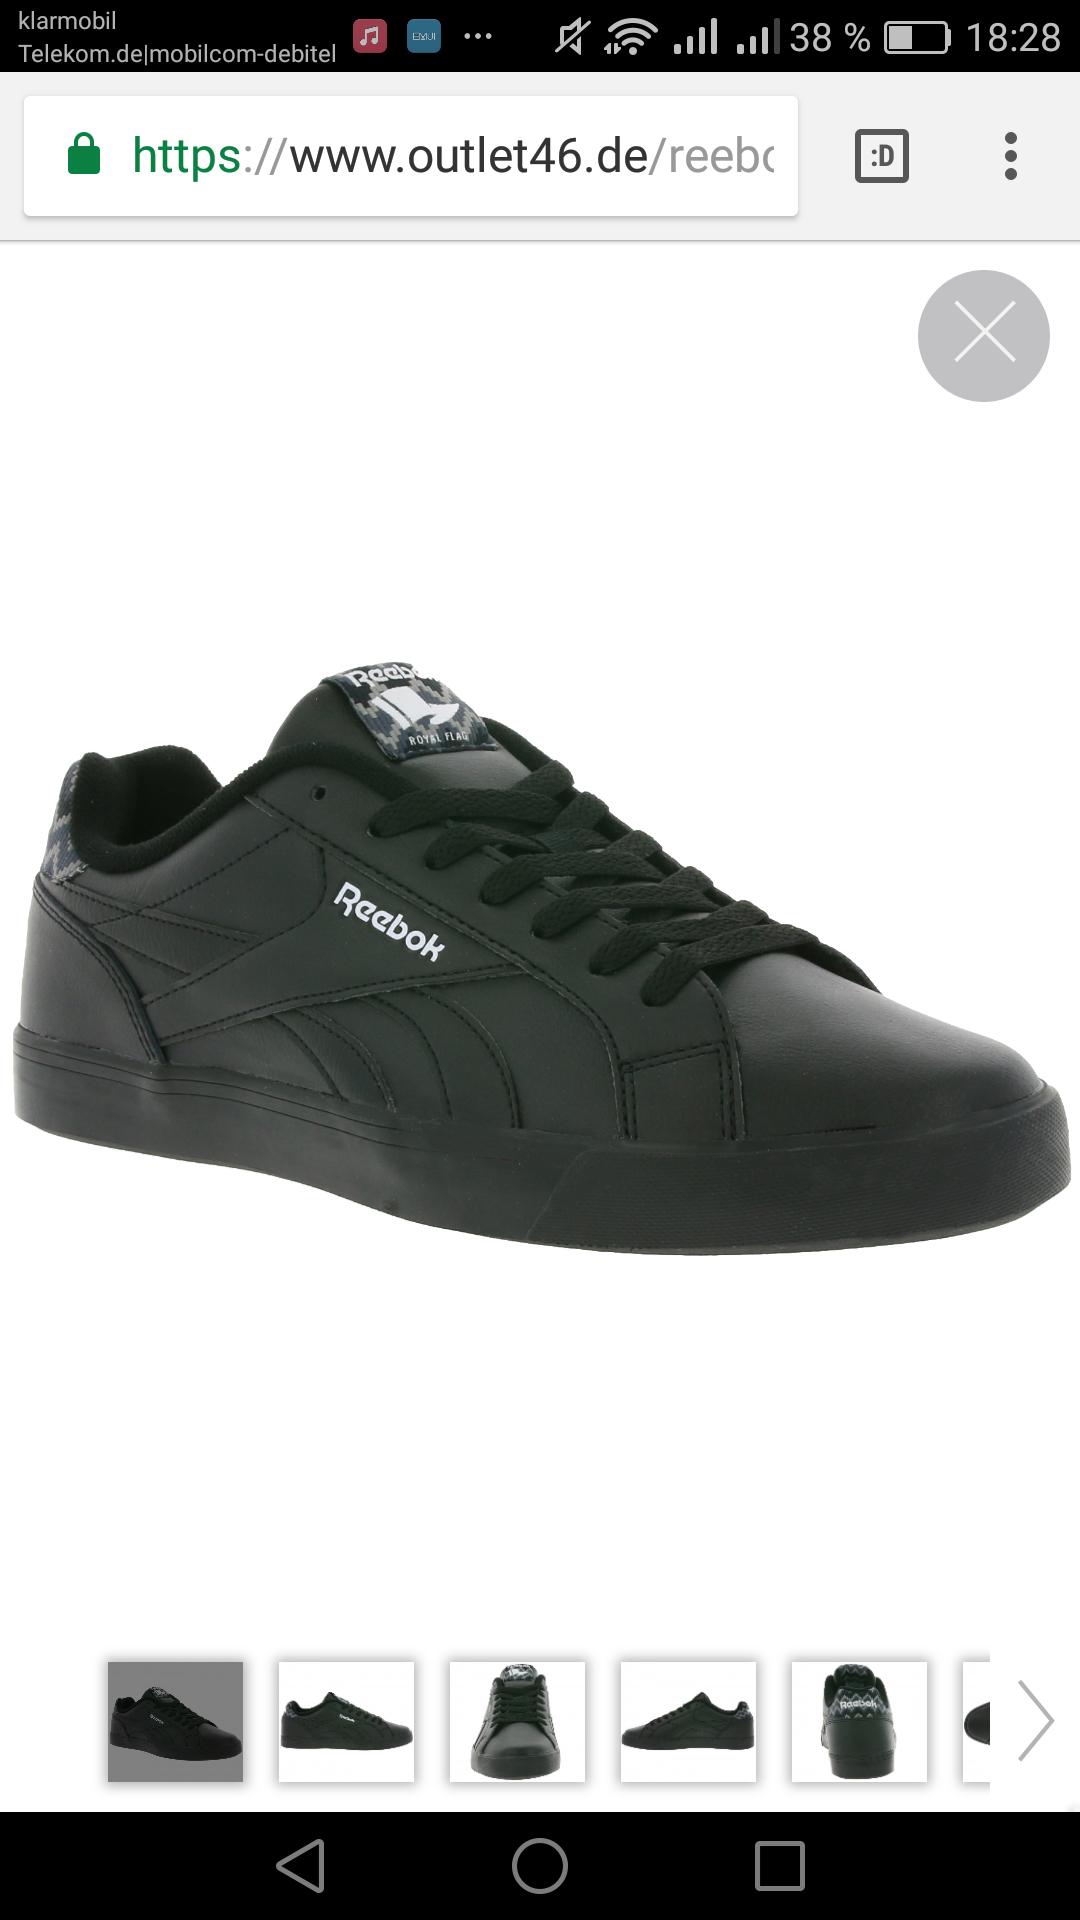 Reebok Royal Complete 2LL Herren Sneaker Schwarz 40,5-46, outlet46